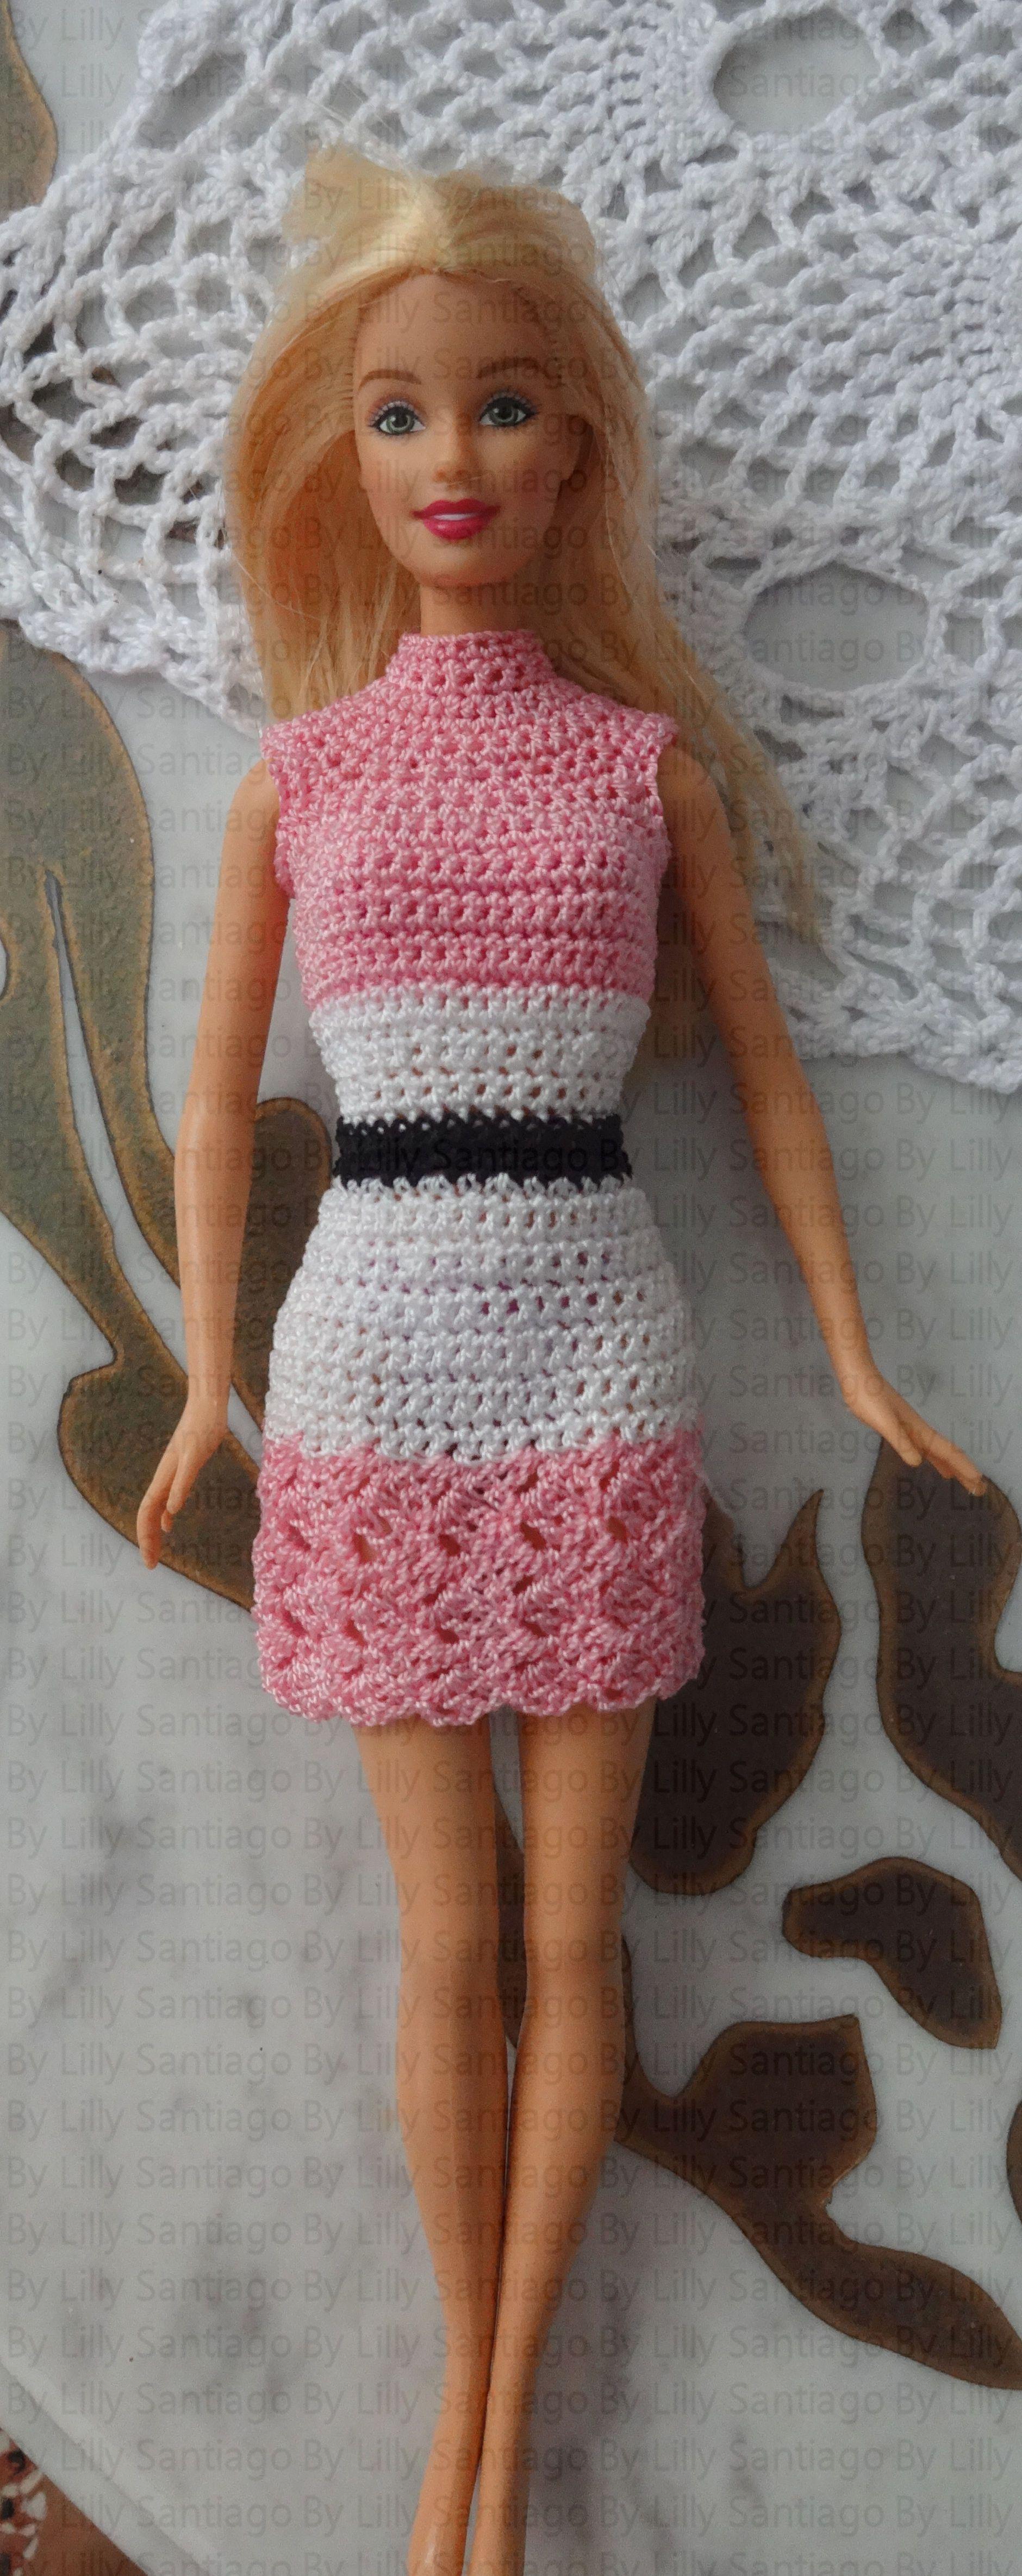 Pin von Nair Lisboa auf Boneca Barbie e outras   Pinterest   Barbie ...